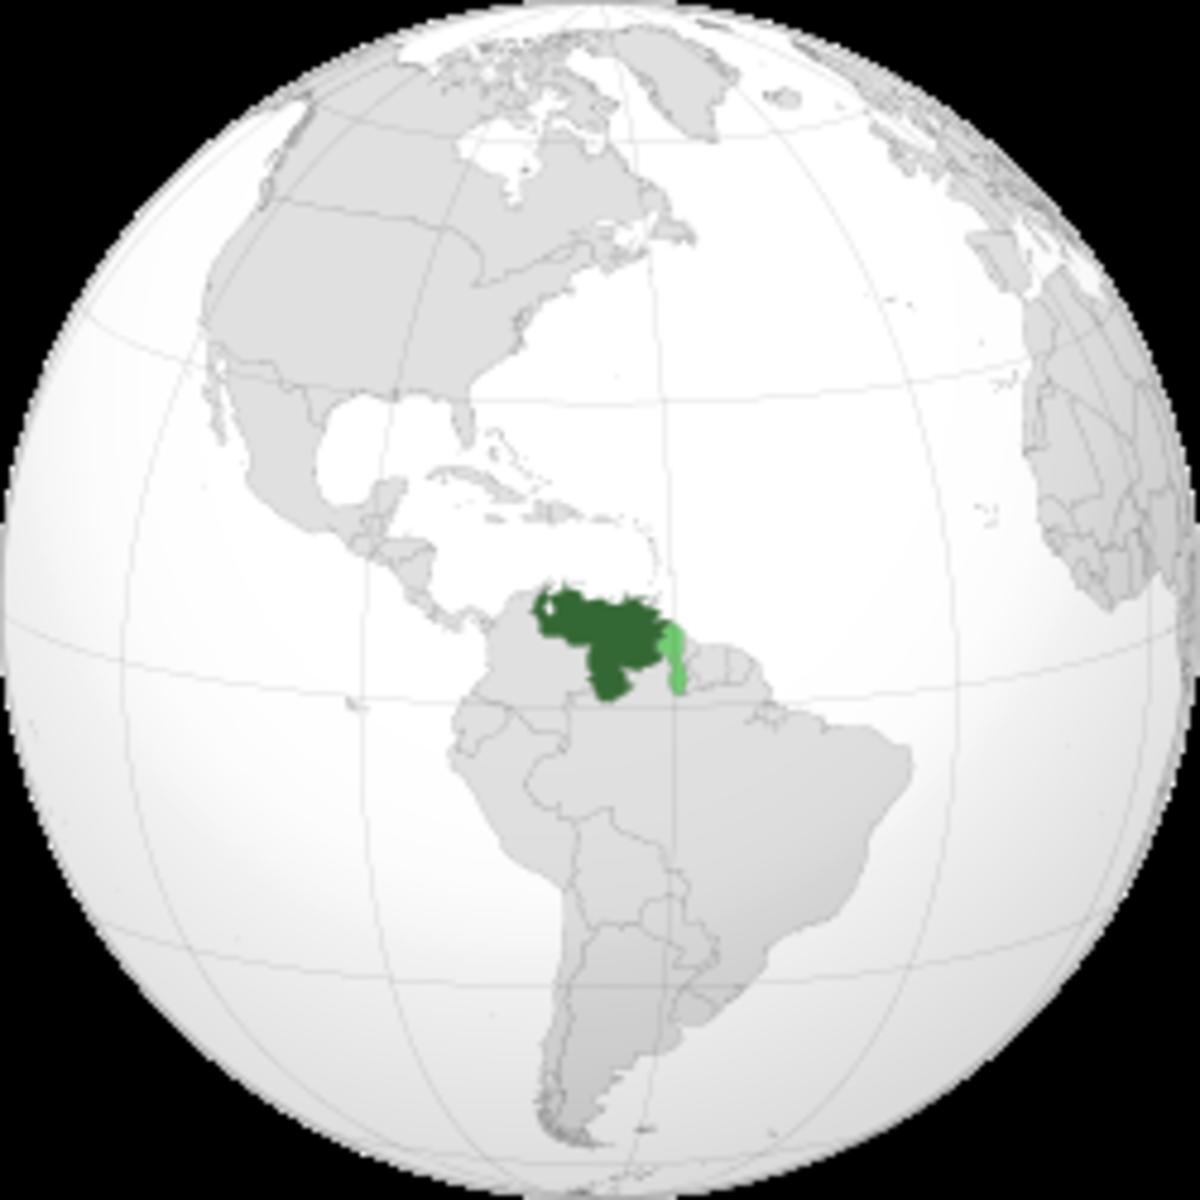 Map showing Venezuela